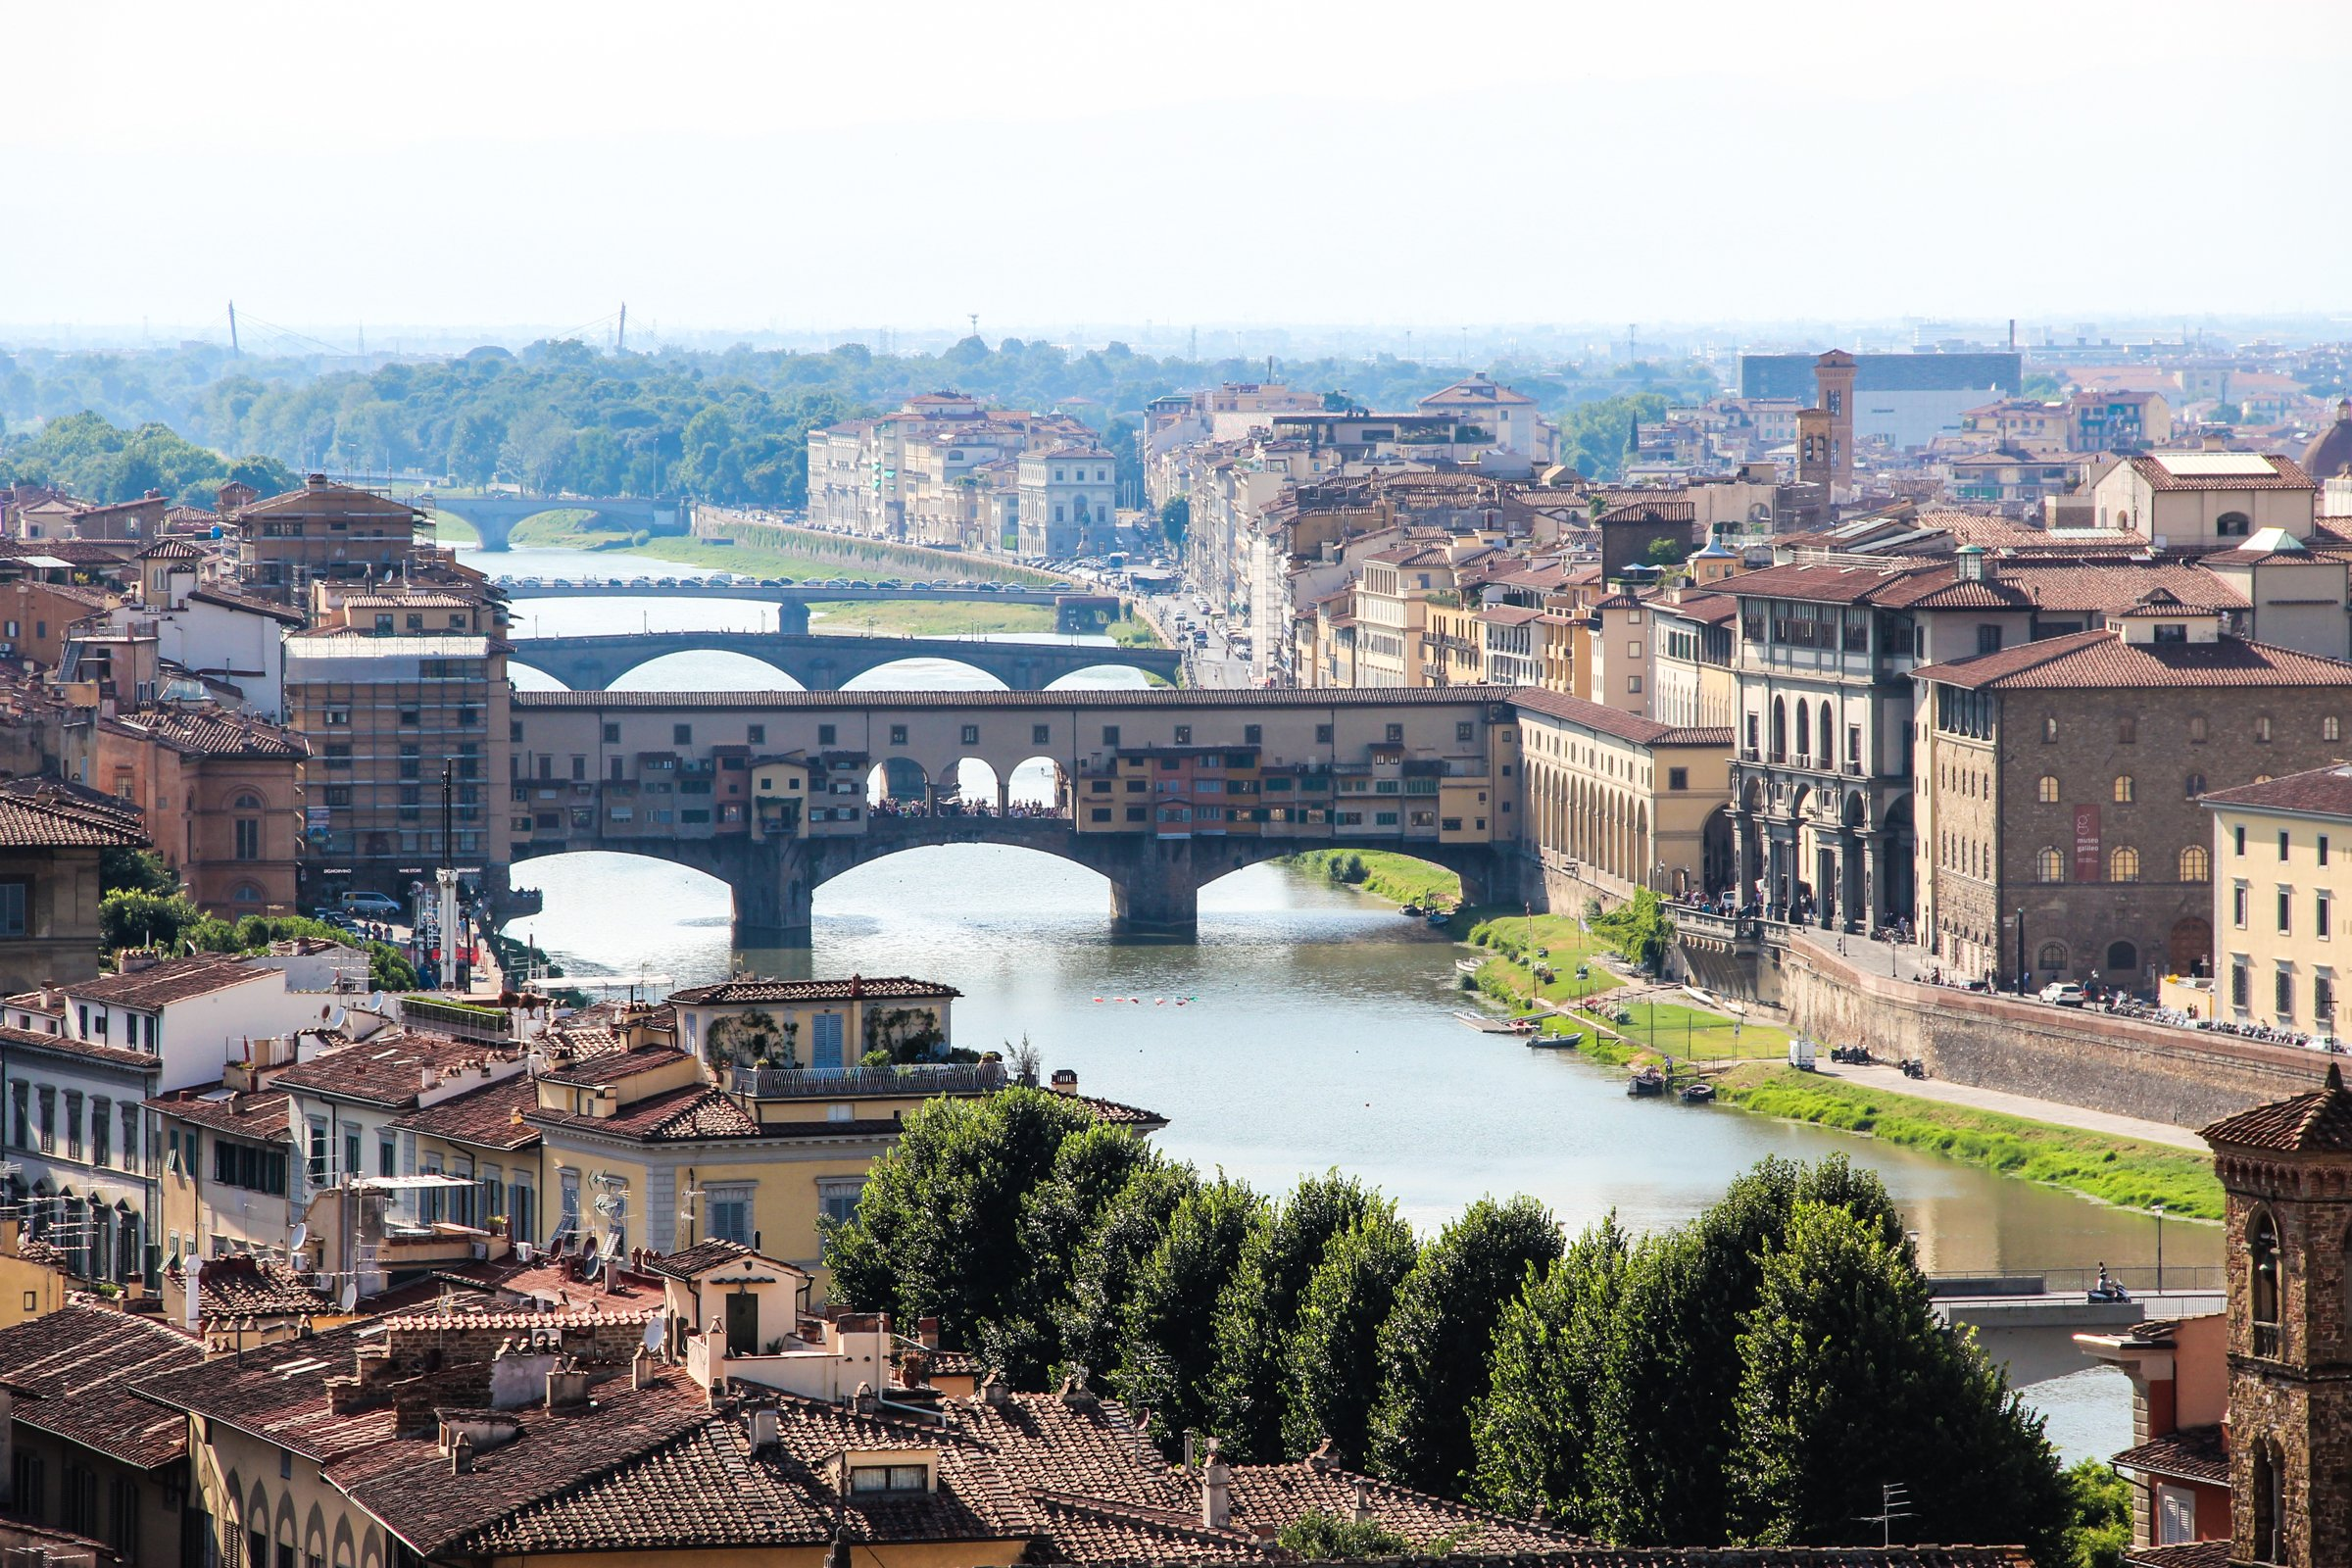 Buildings On Bridge Over River